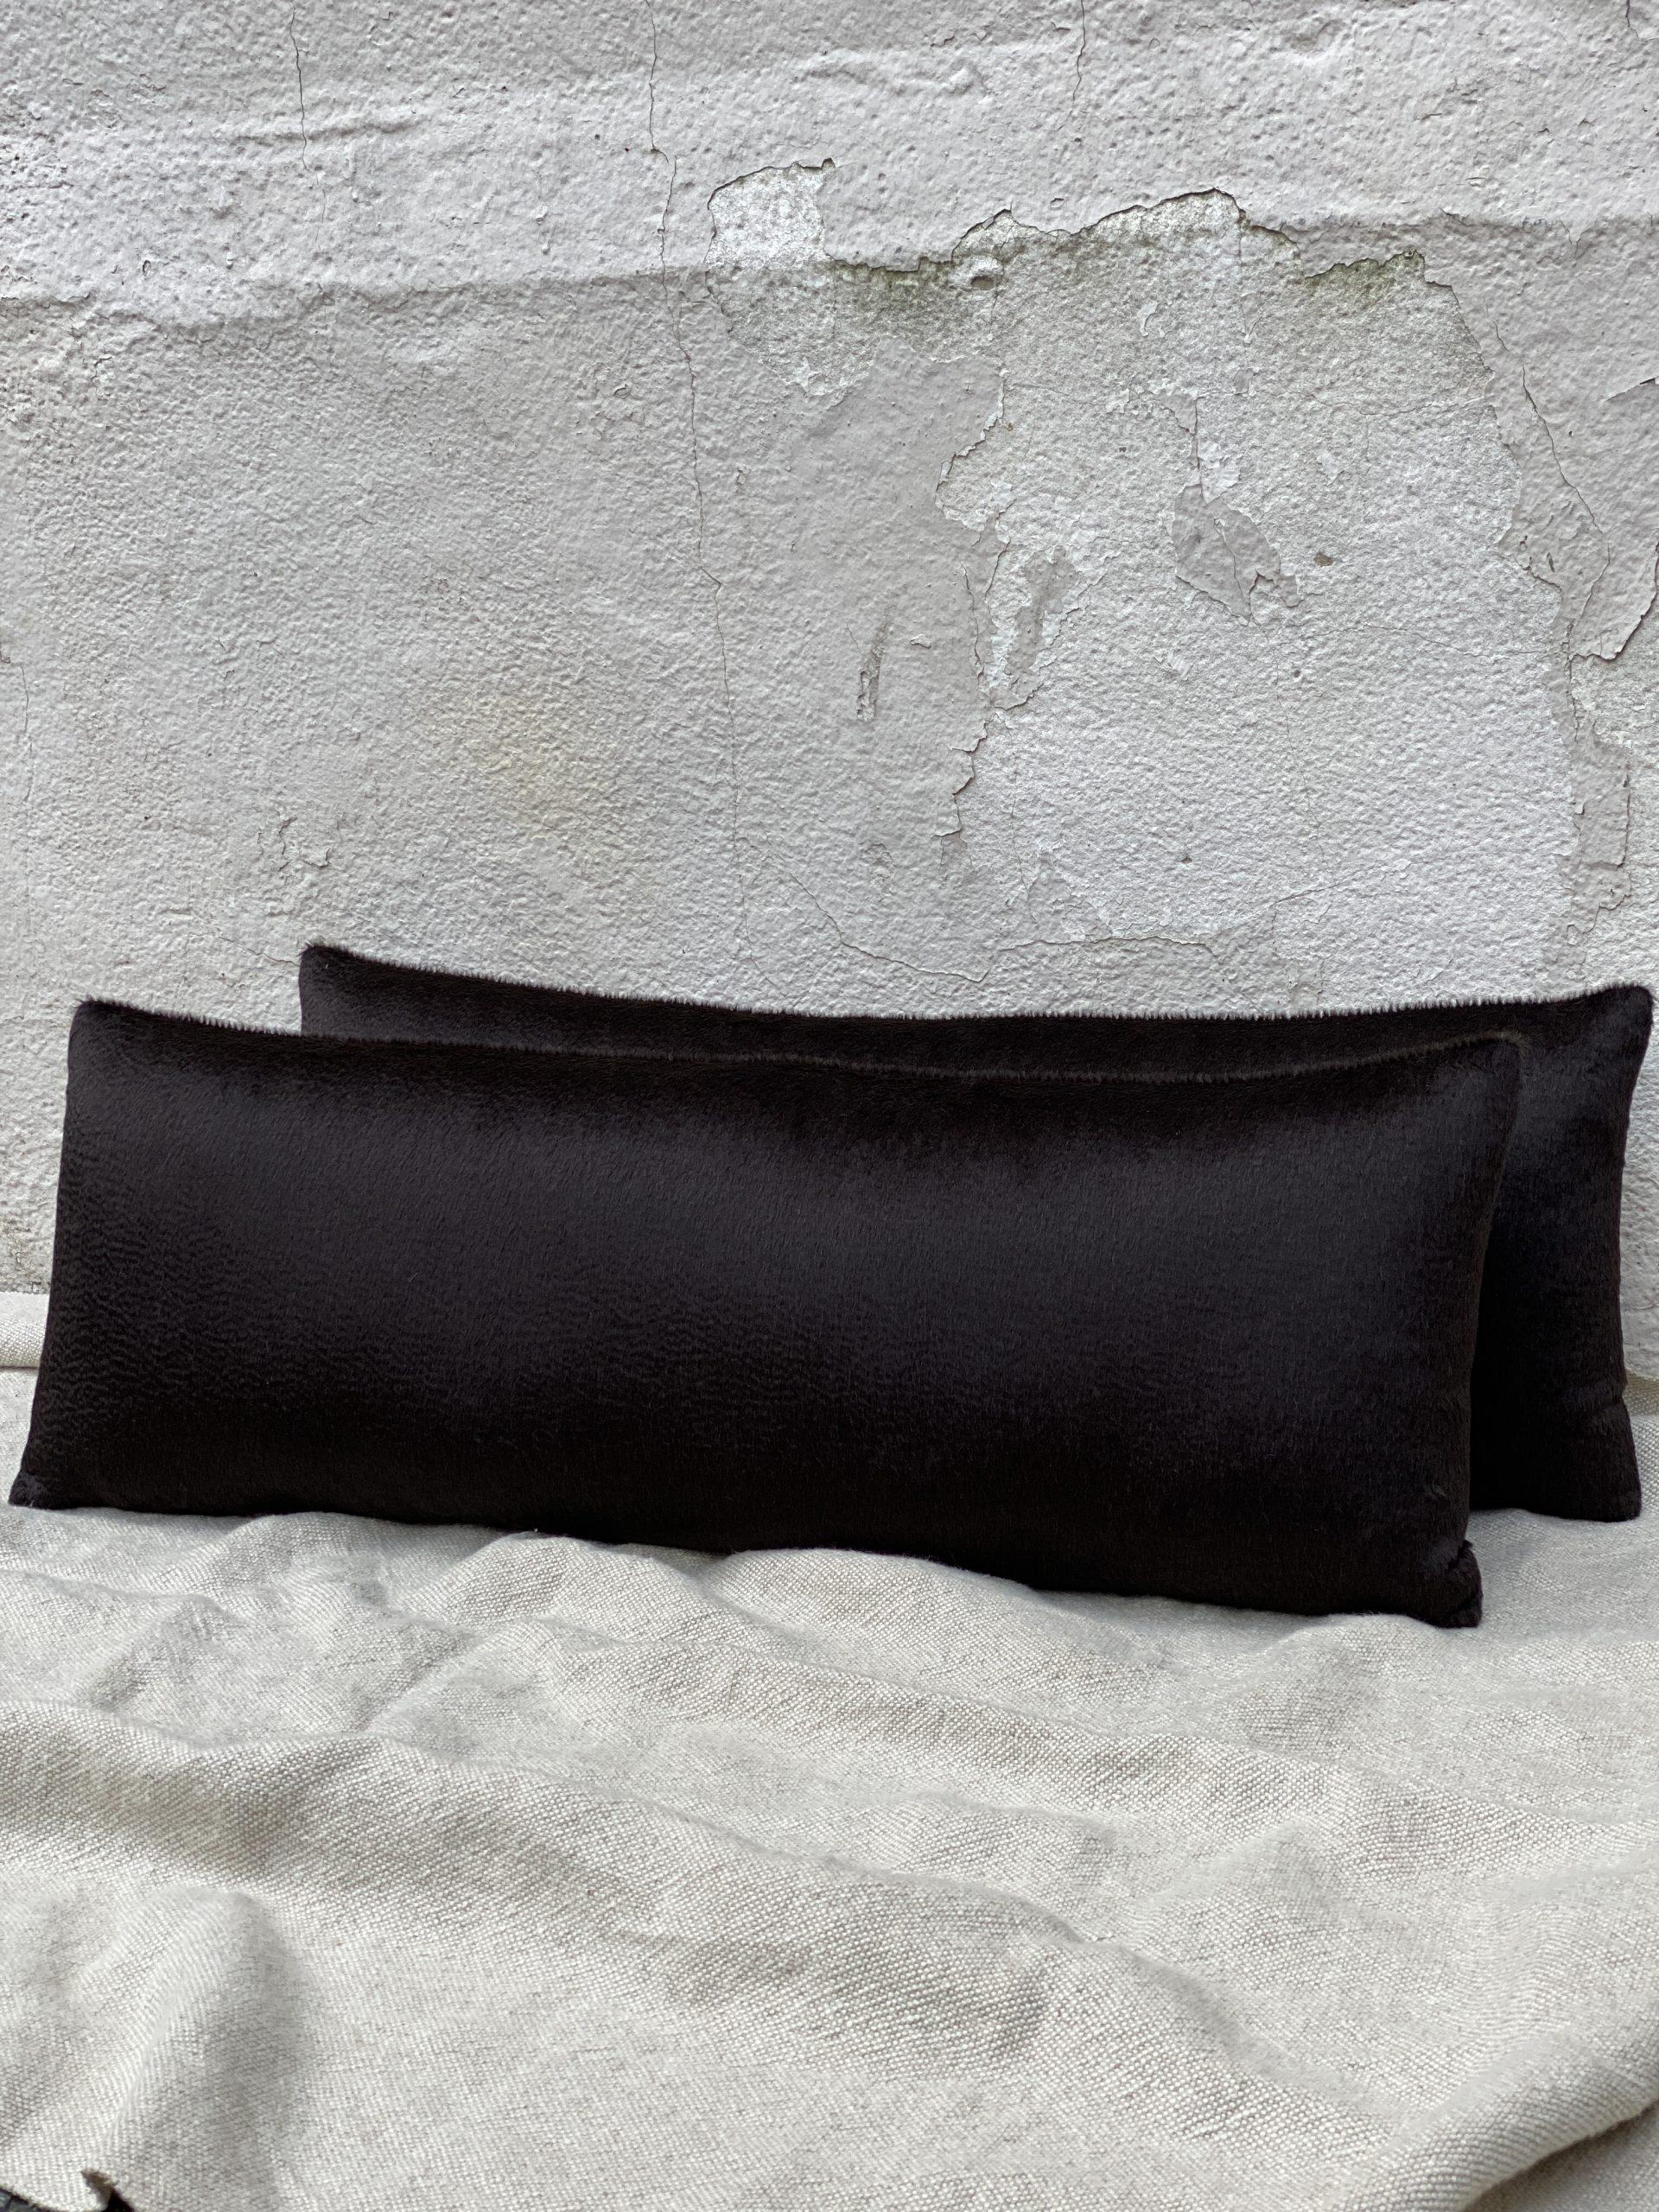 Hendrick Interiors Pillows